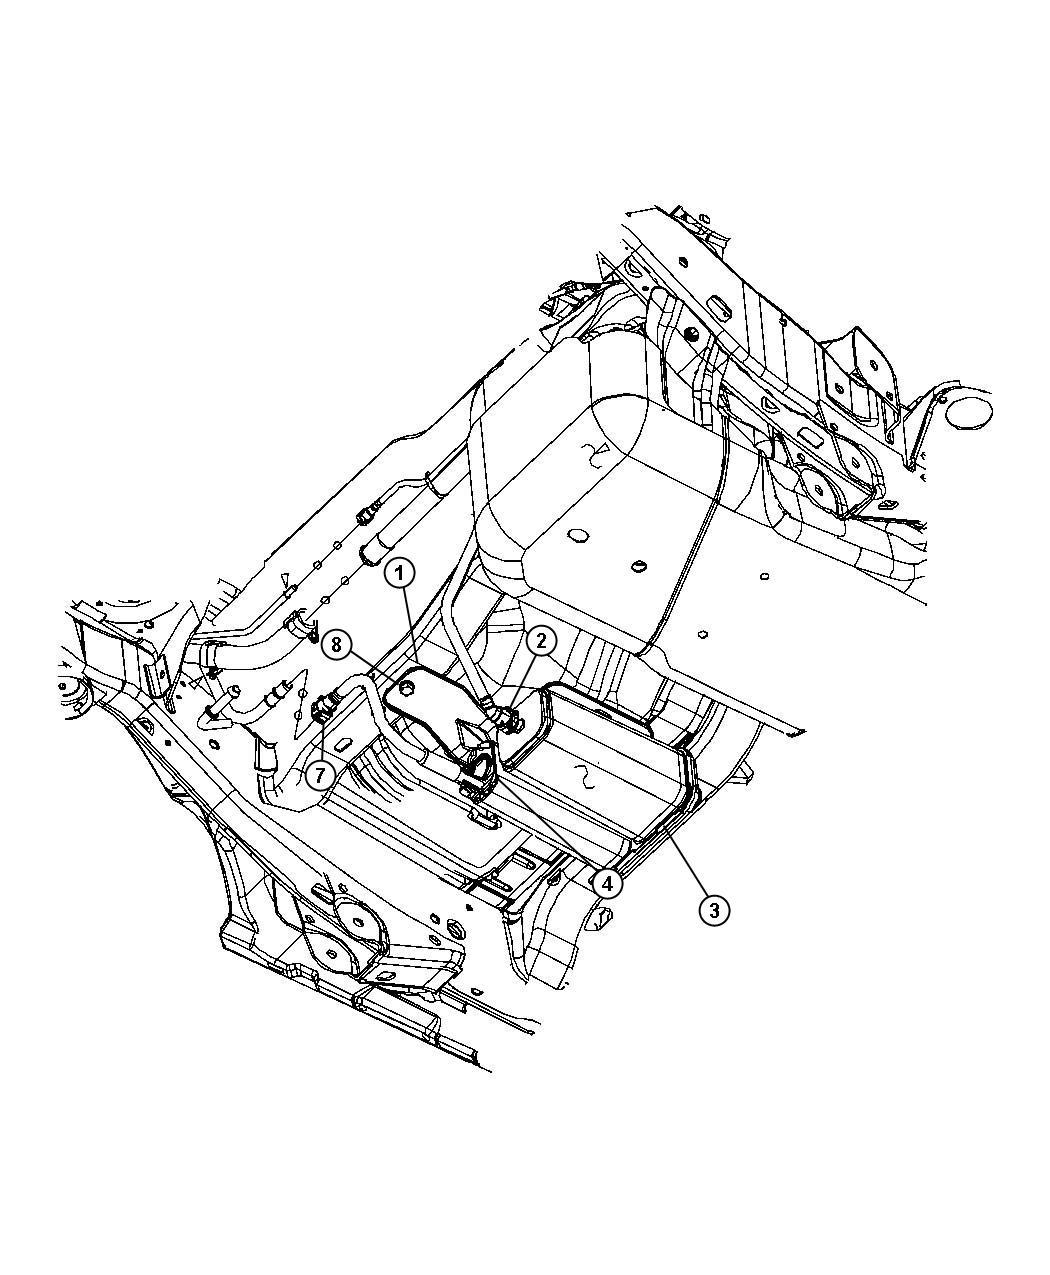 Jeep Wrangler Bracket Vapor Canister Export Tank